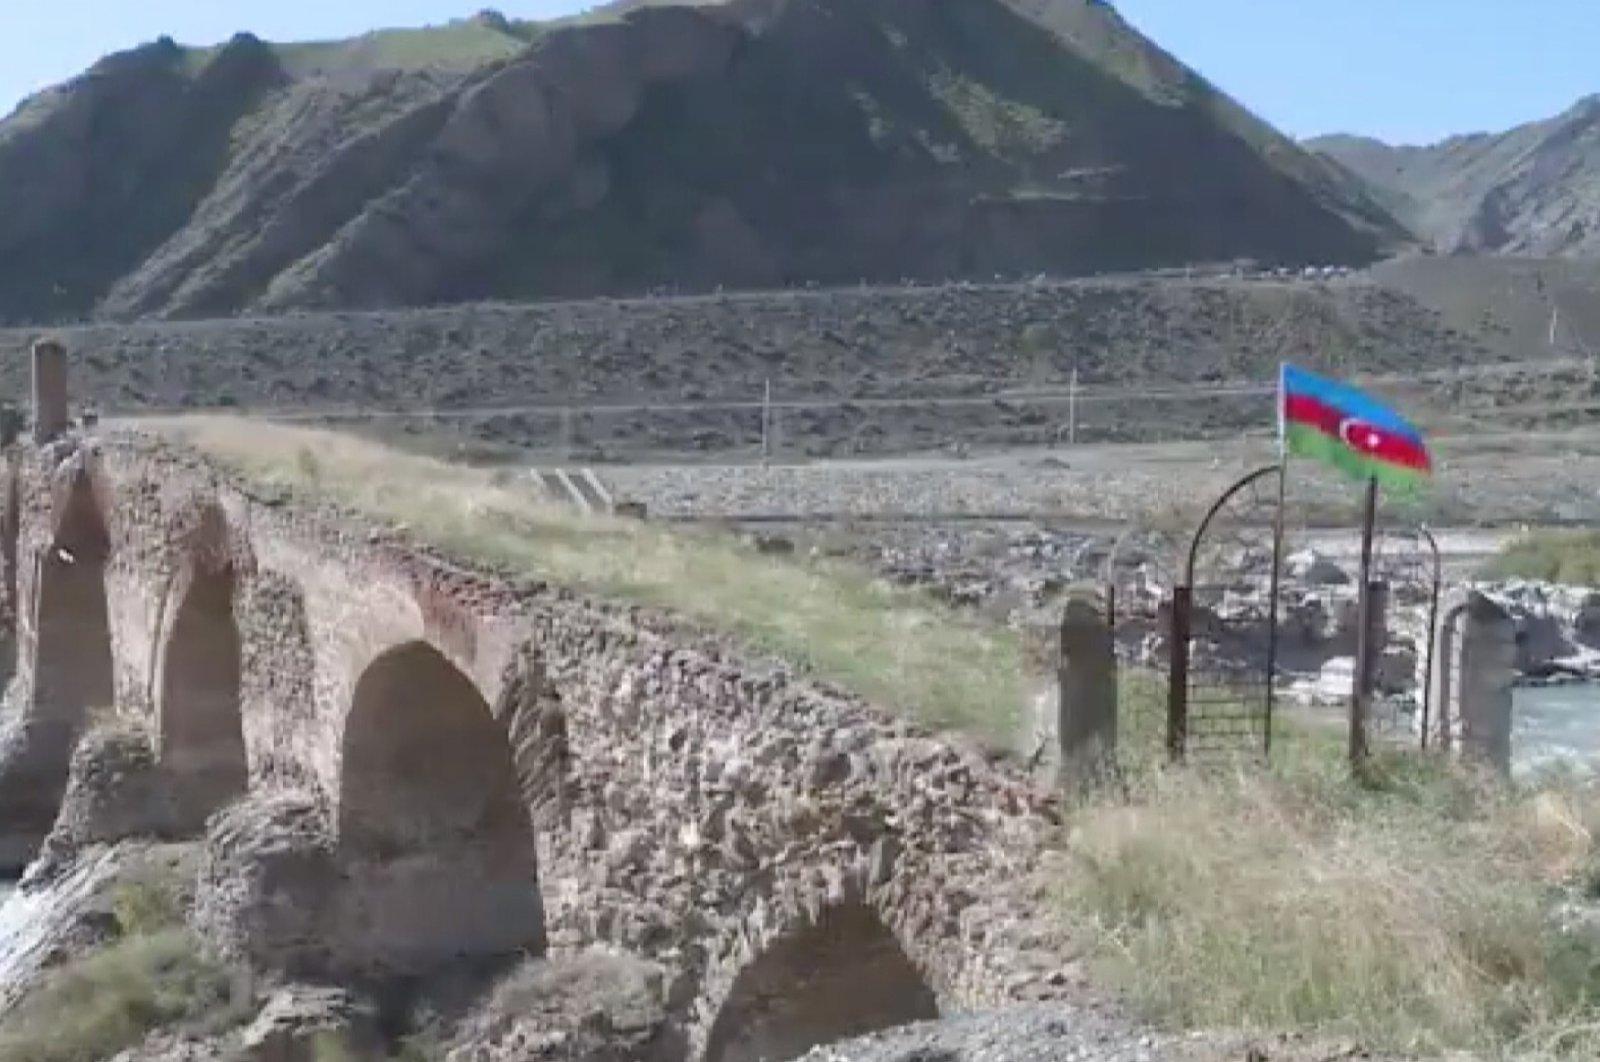 Azerbaijani Armed Forces have raised Azerbaijan's flag over the ancient Khudaferin Bridge amid a conflict with Armenia, Oct. 18, 2020 (AA Photo)